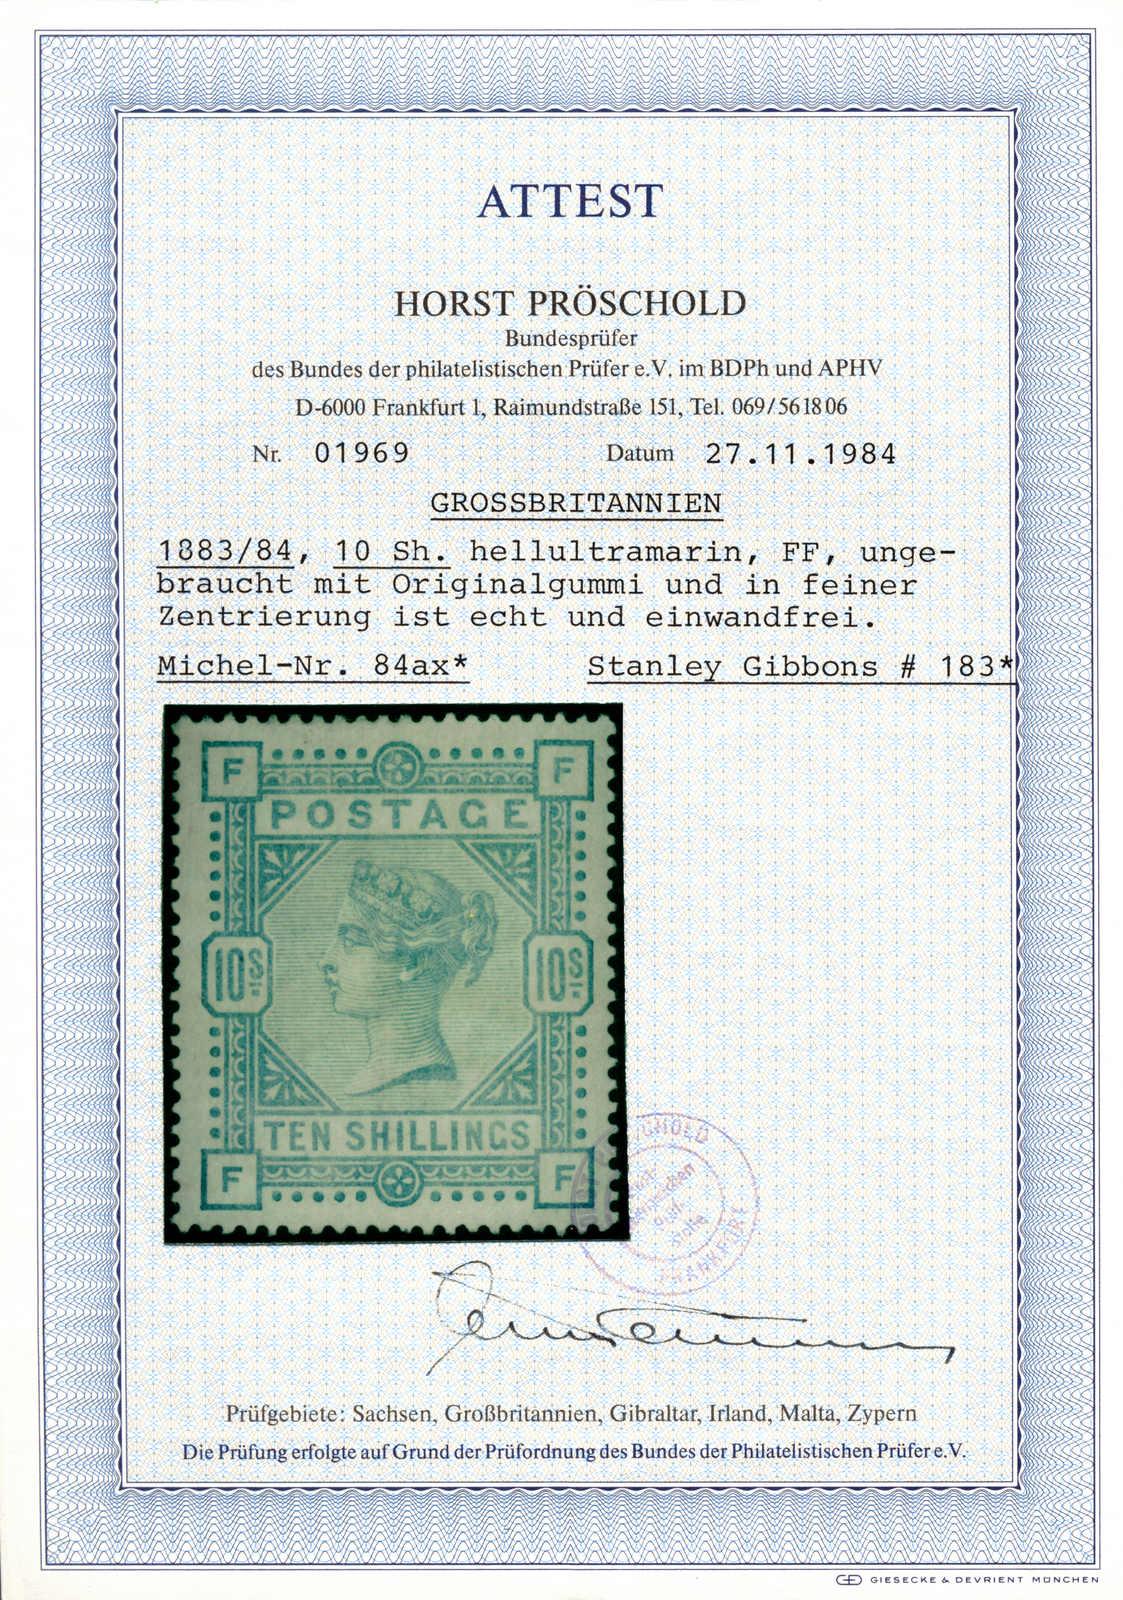 Lot 30203 - europa grossbritannien -  classicphil GmbH 6'th classicphil Auction - Day 2